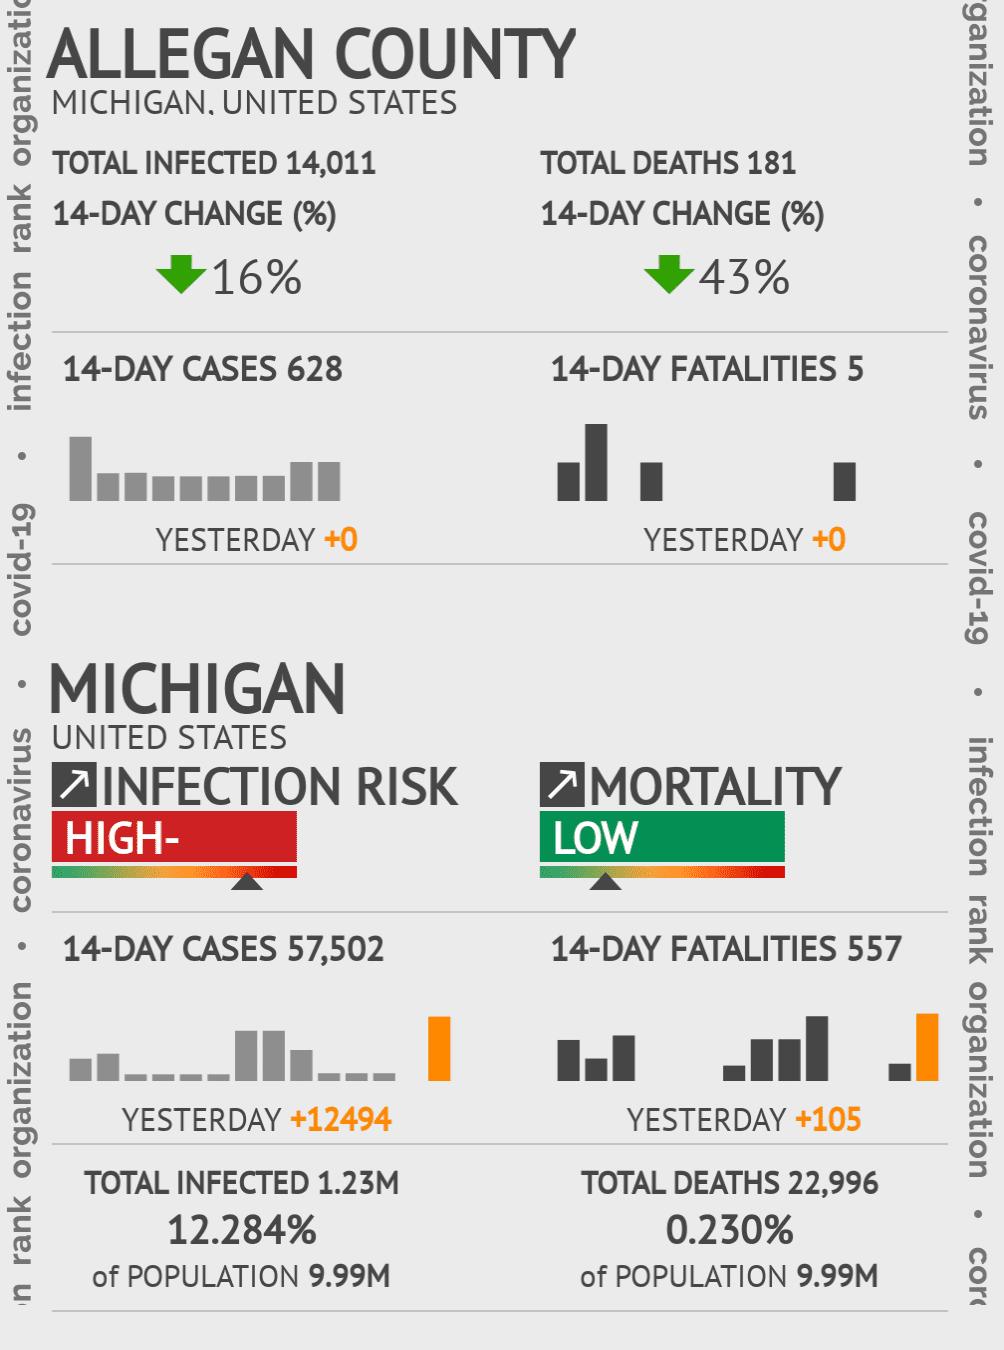 Allegan County Coronavirus Covid-19 Risk of Infection on October 28, 2020